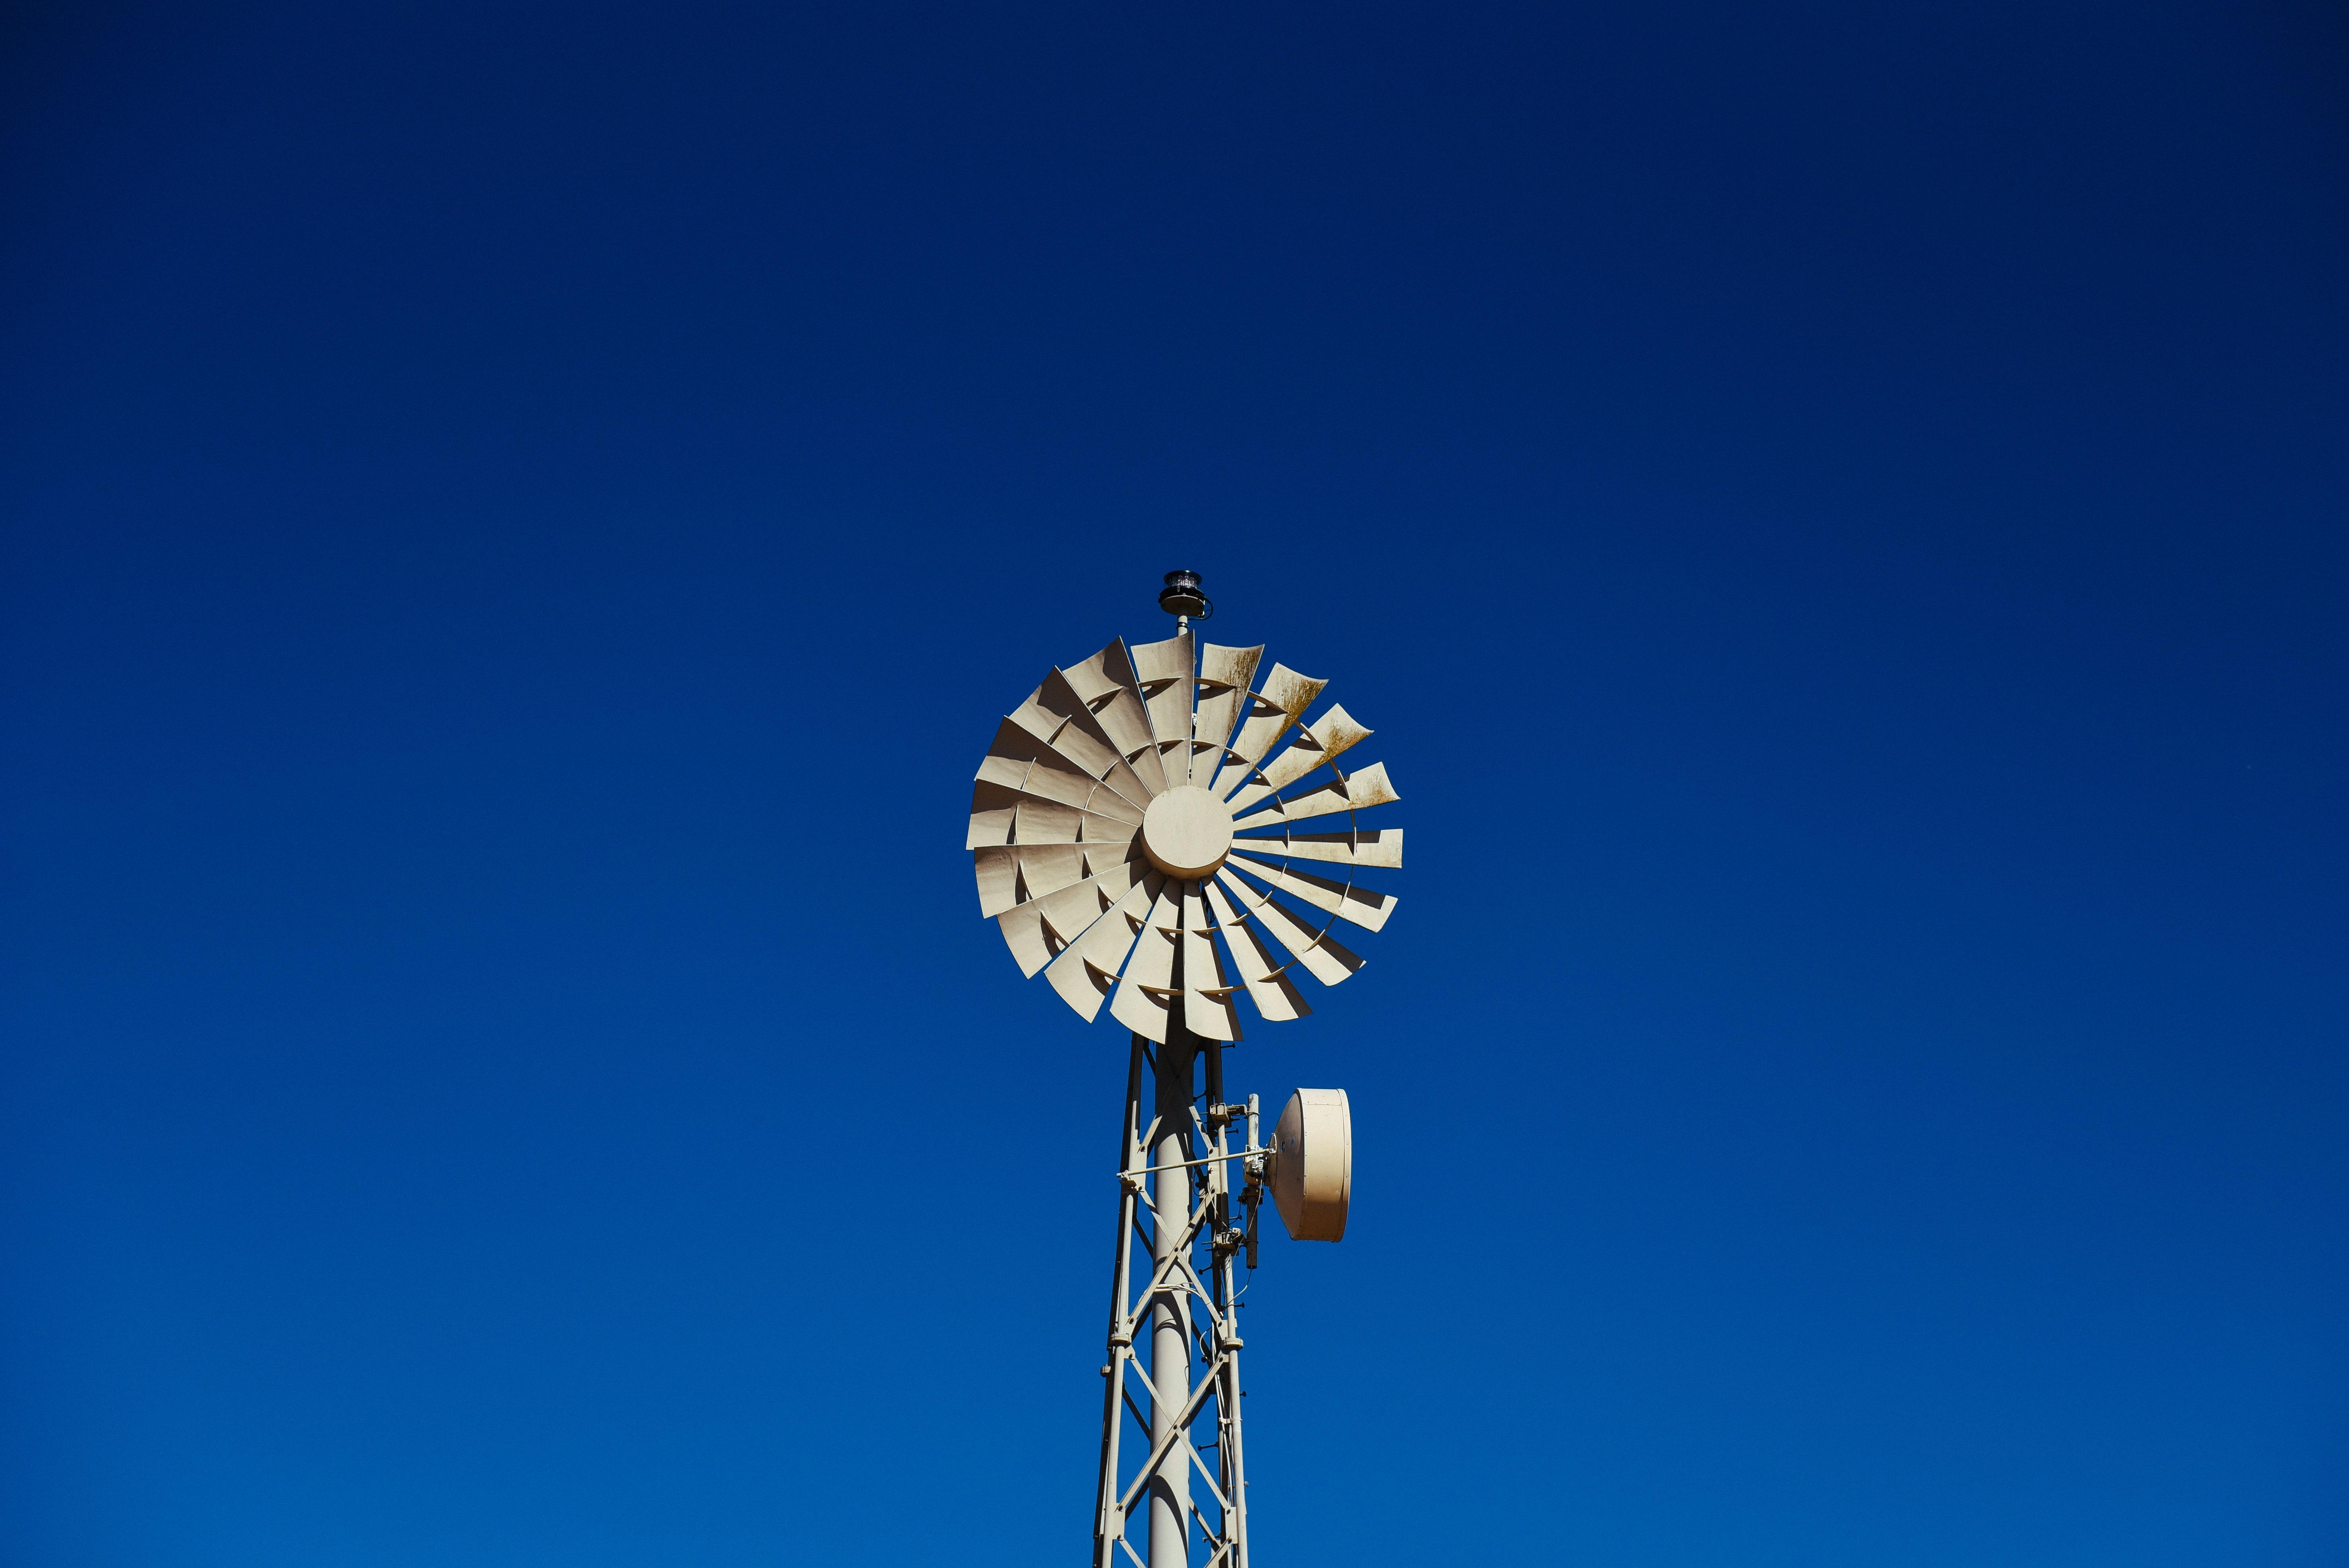 low angle photography beige wind turbine